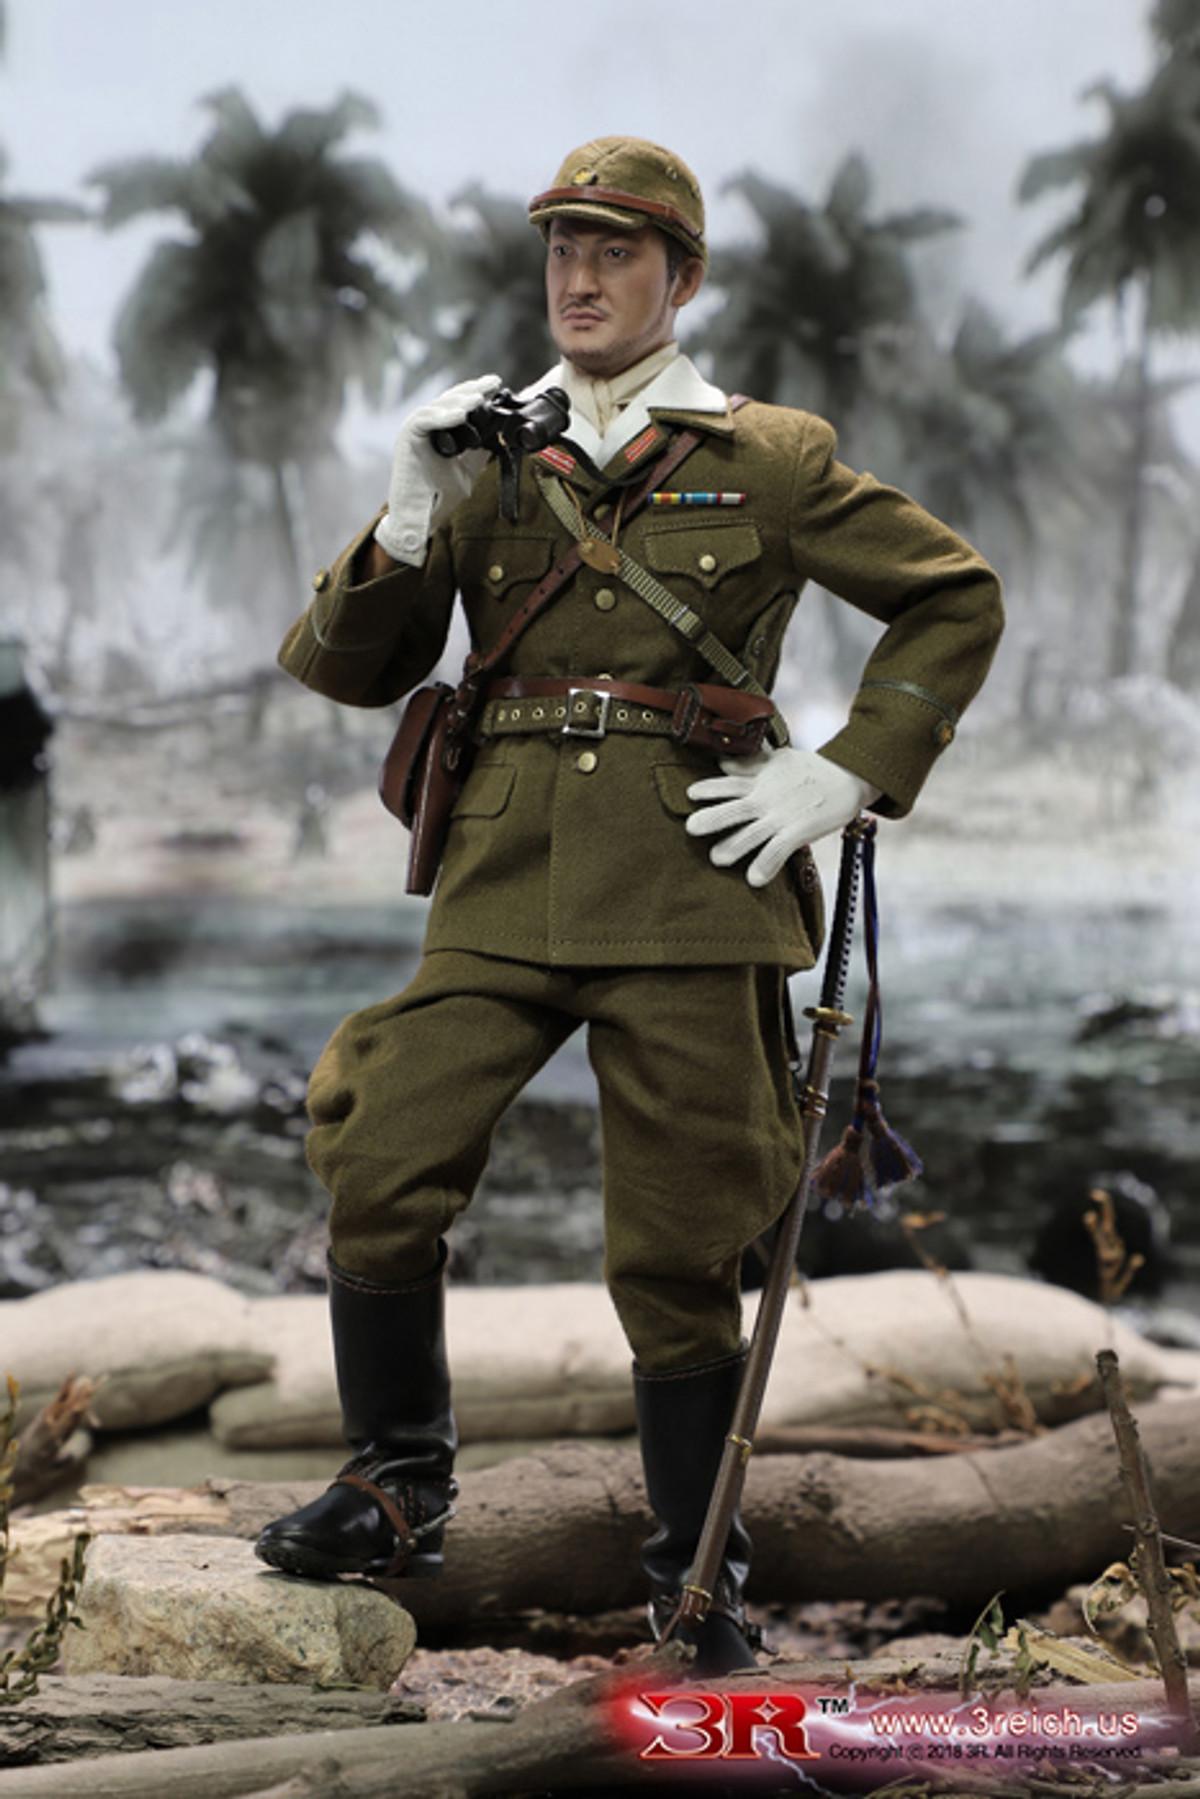 3R DID DRAGON IN DREAMS 1:6TH SCALE WW2 JAPANESE IJA 32ND ARMY HANDBOOK /&TAG